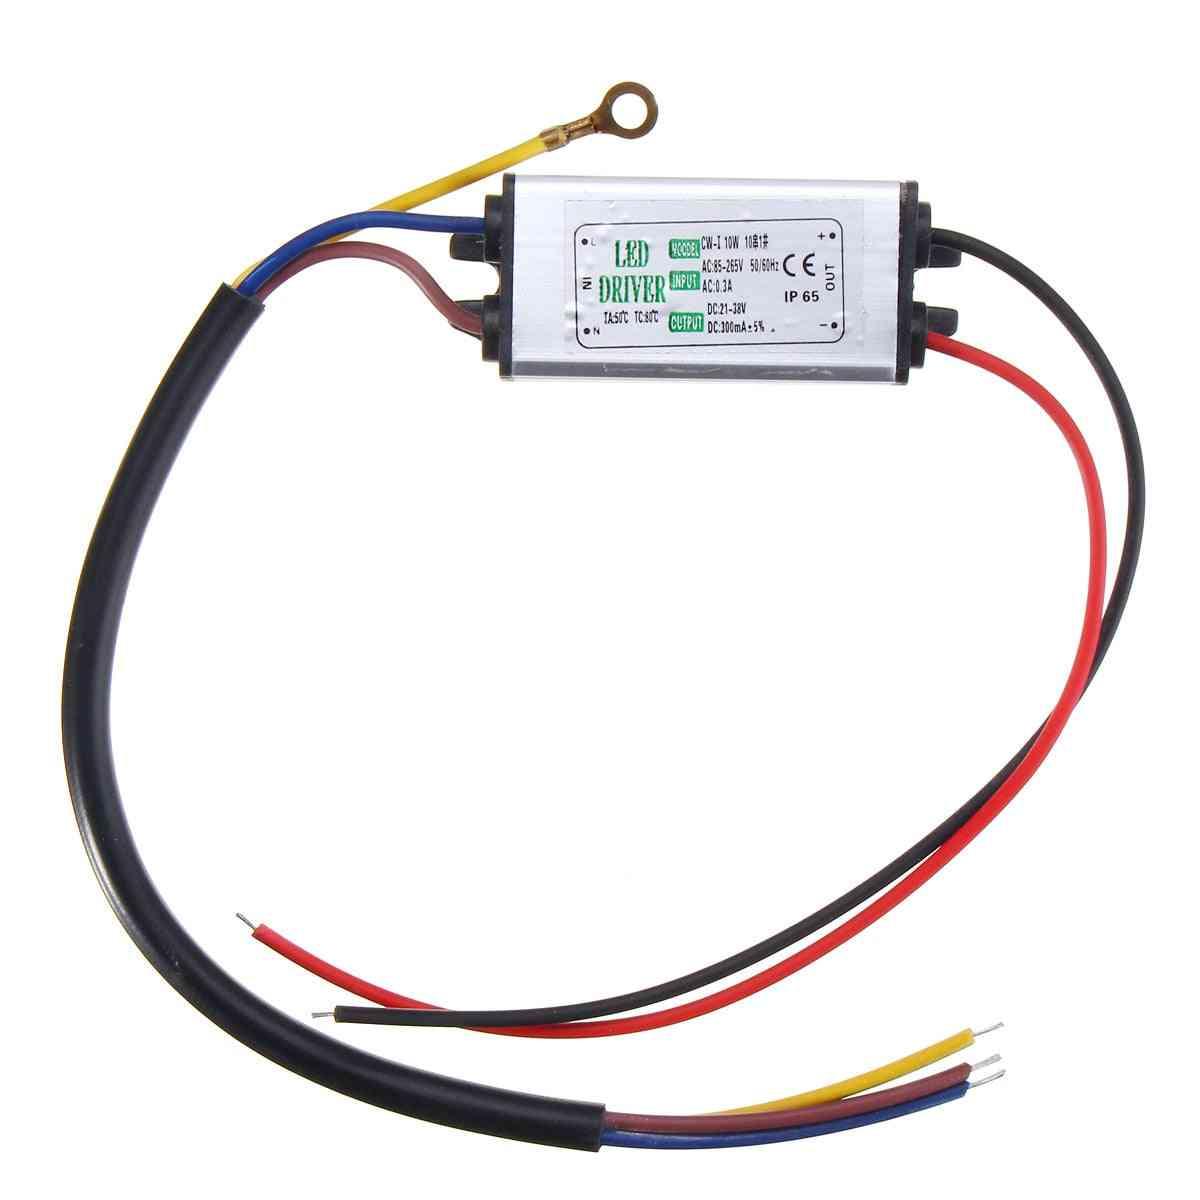 Waterproof High Power Supply - Led Driver Ac85-265v Input Transformer